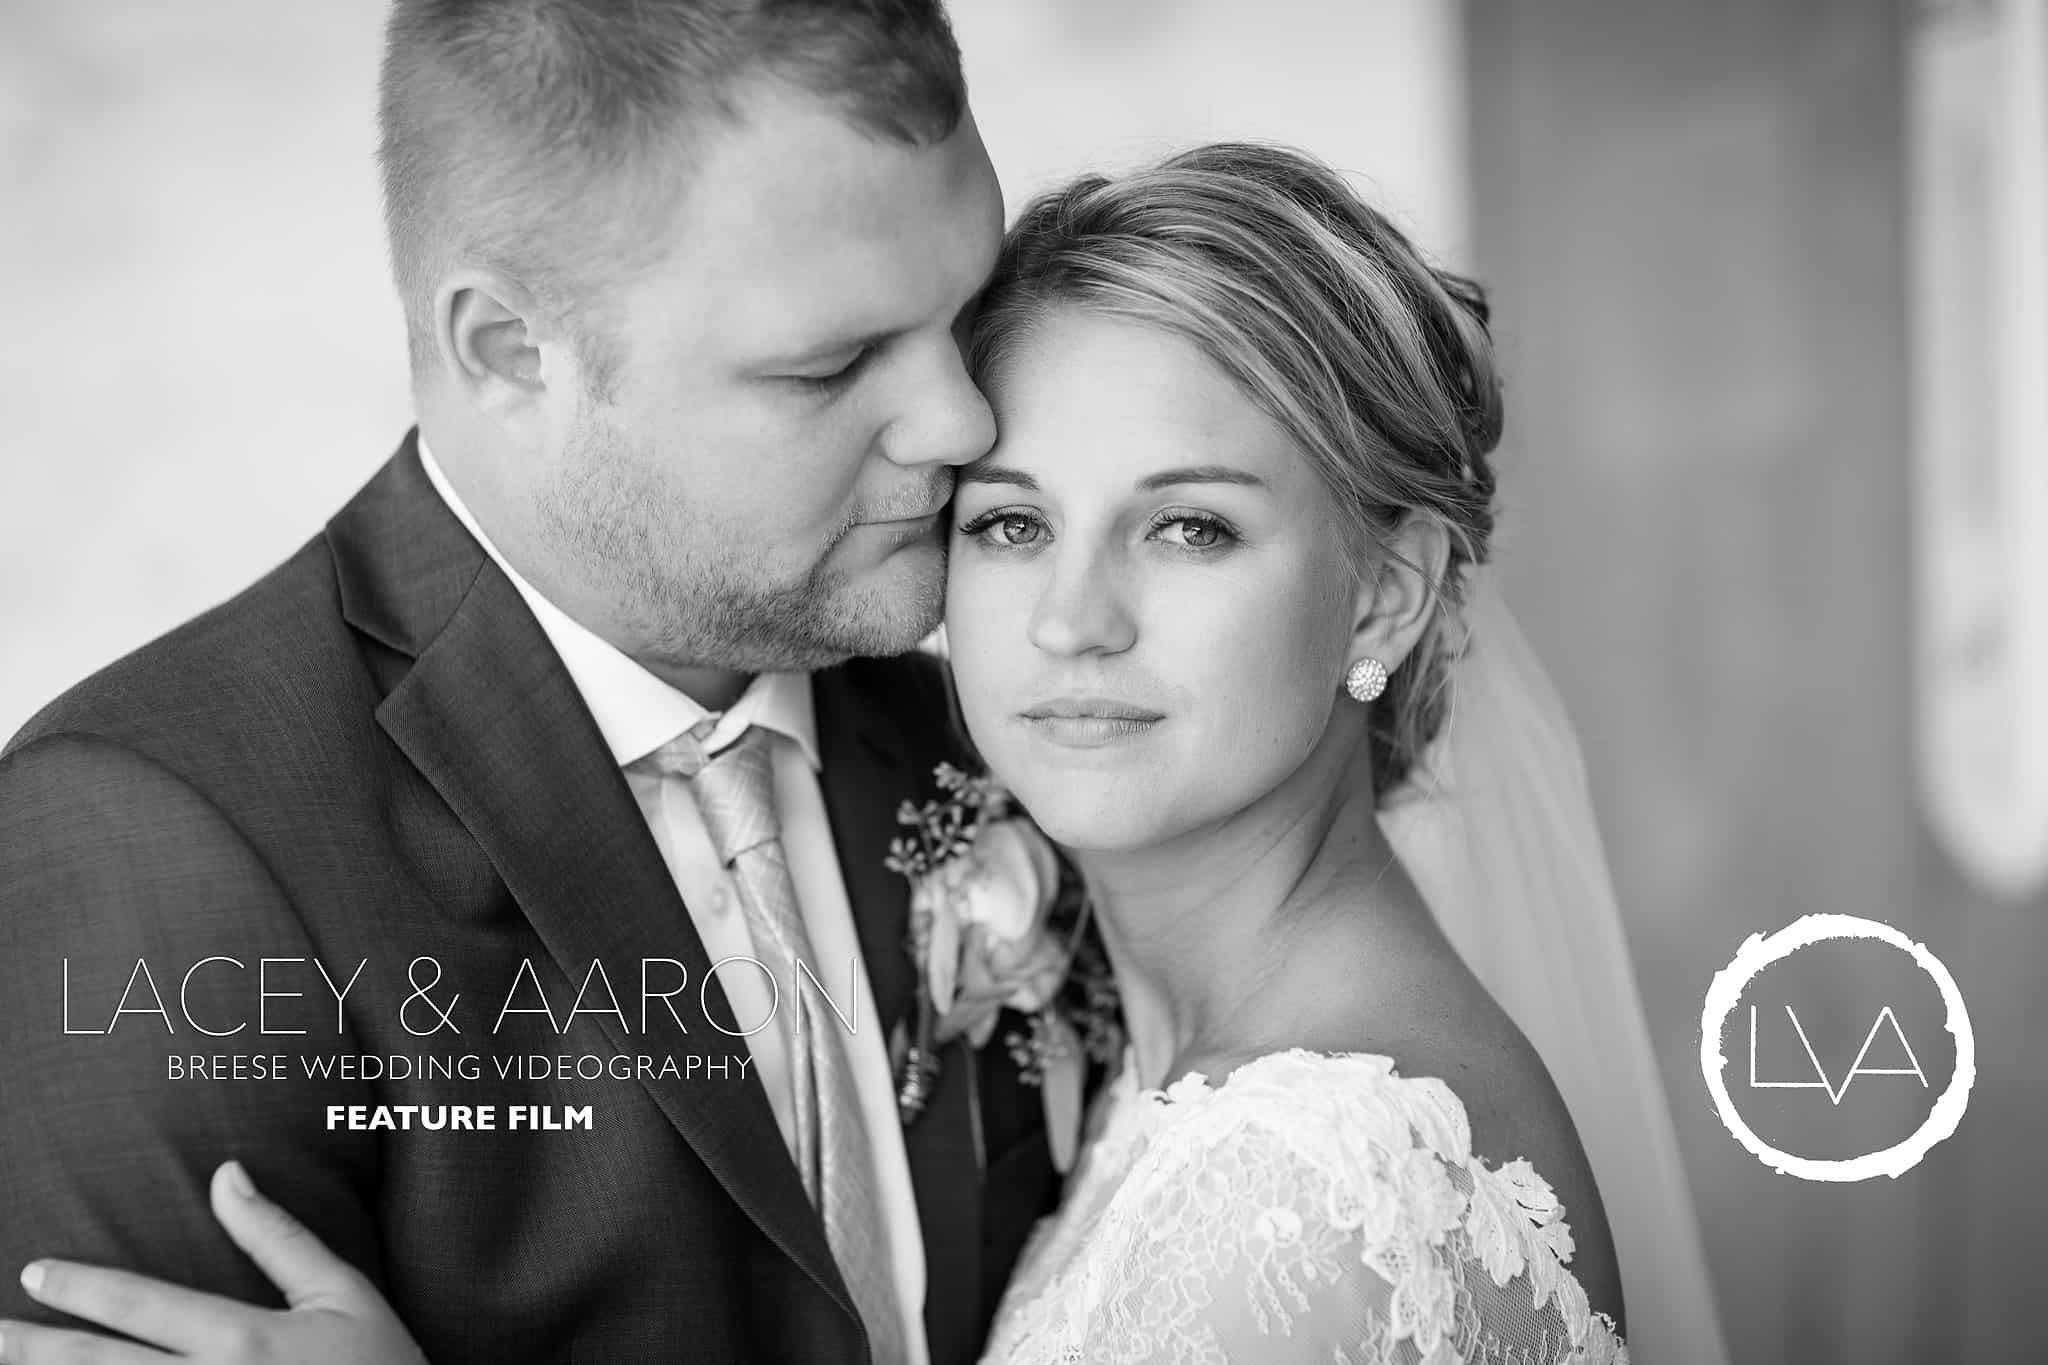 Aaron and lacey wedding